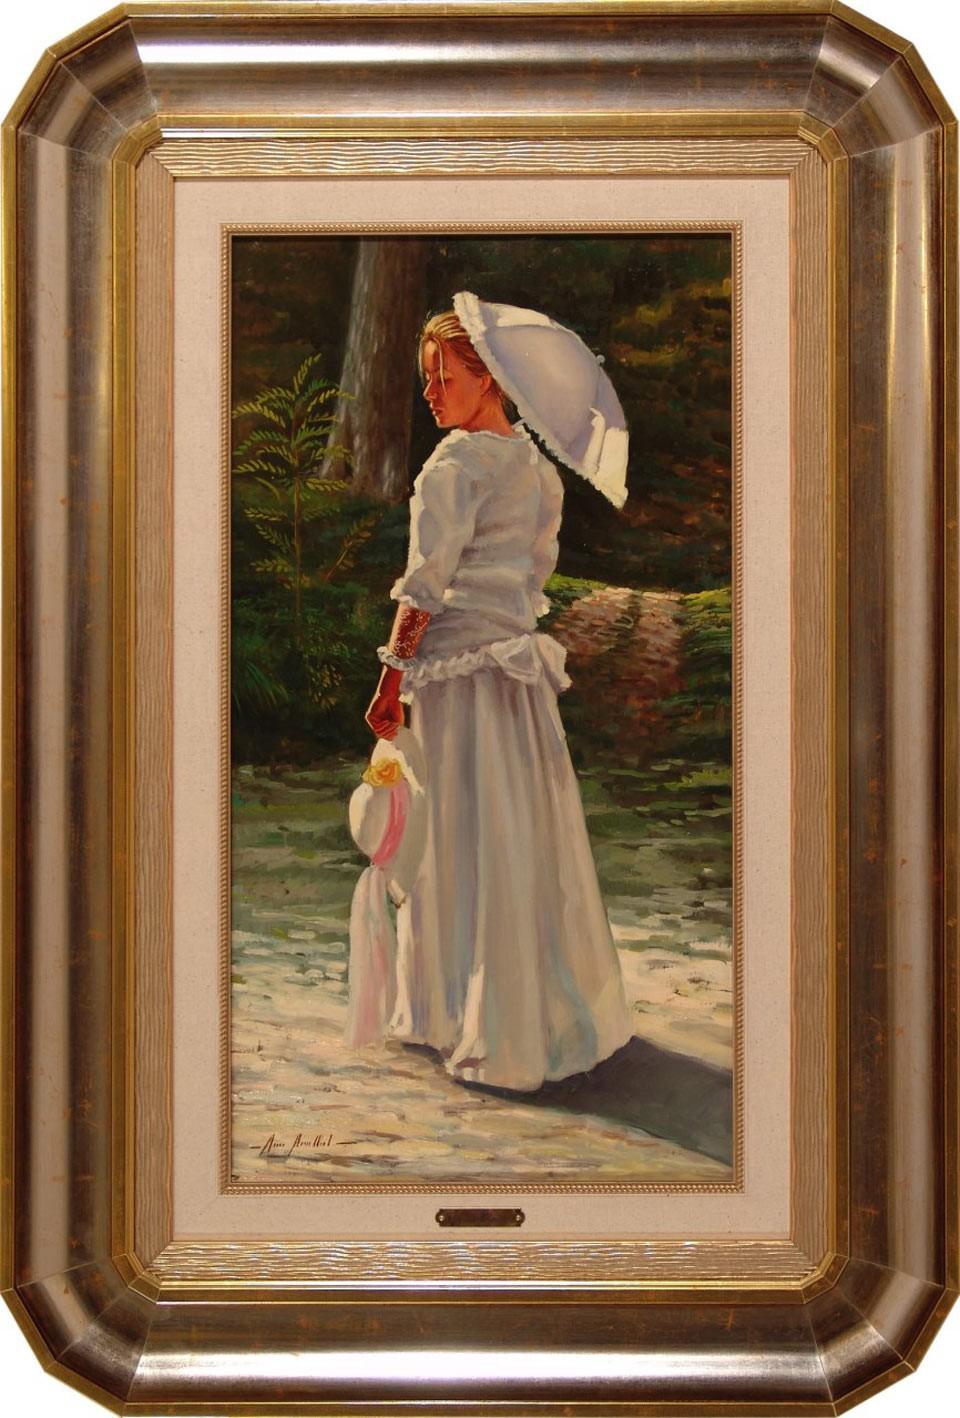 Marisa Mallol: La dama del sombrero blanco